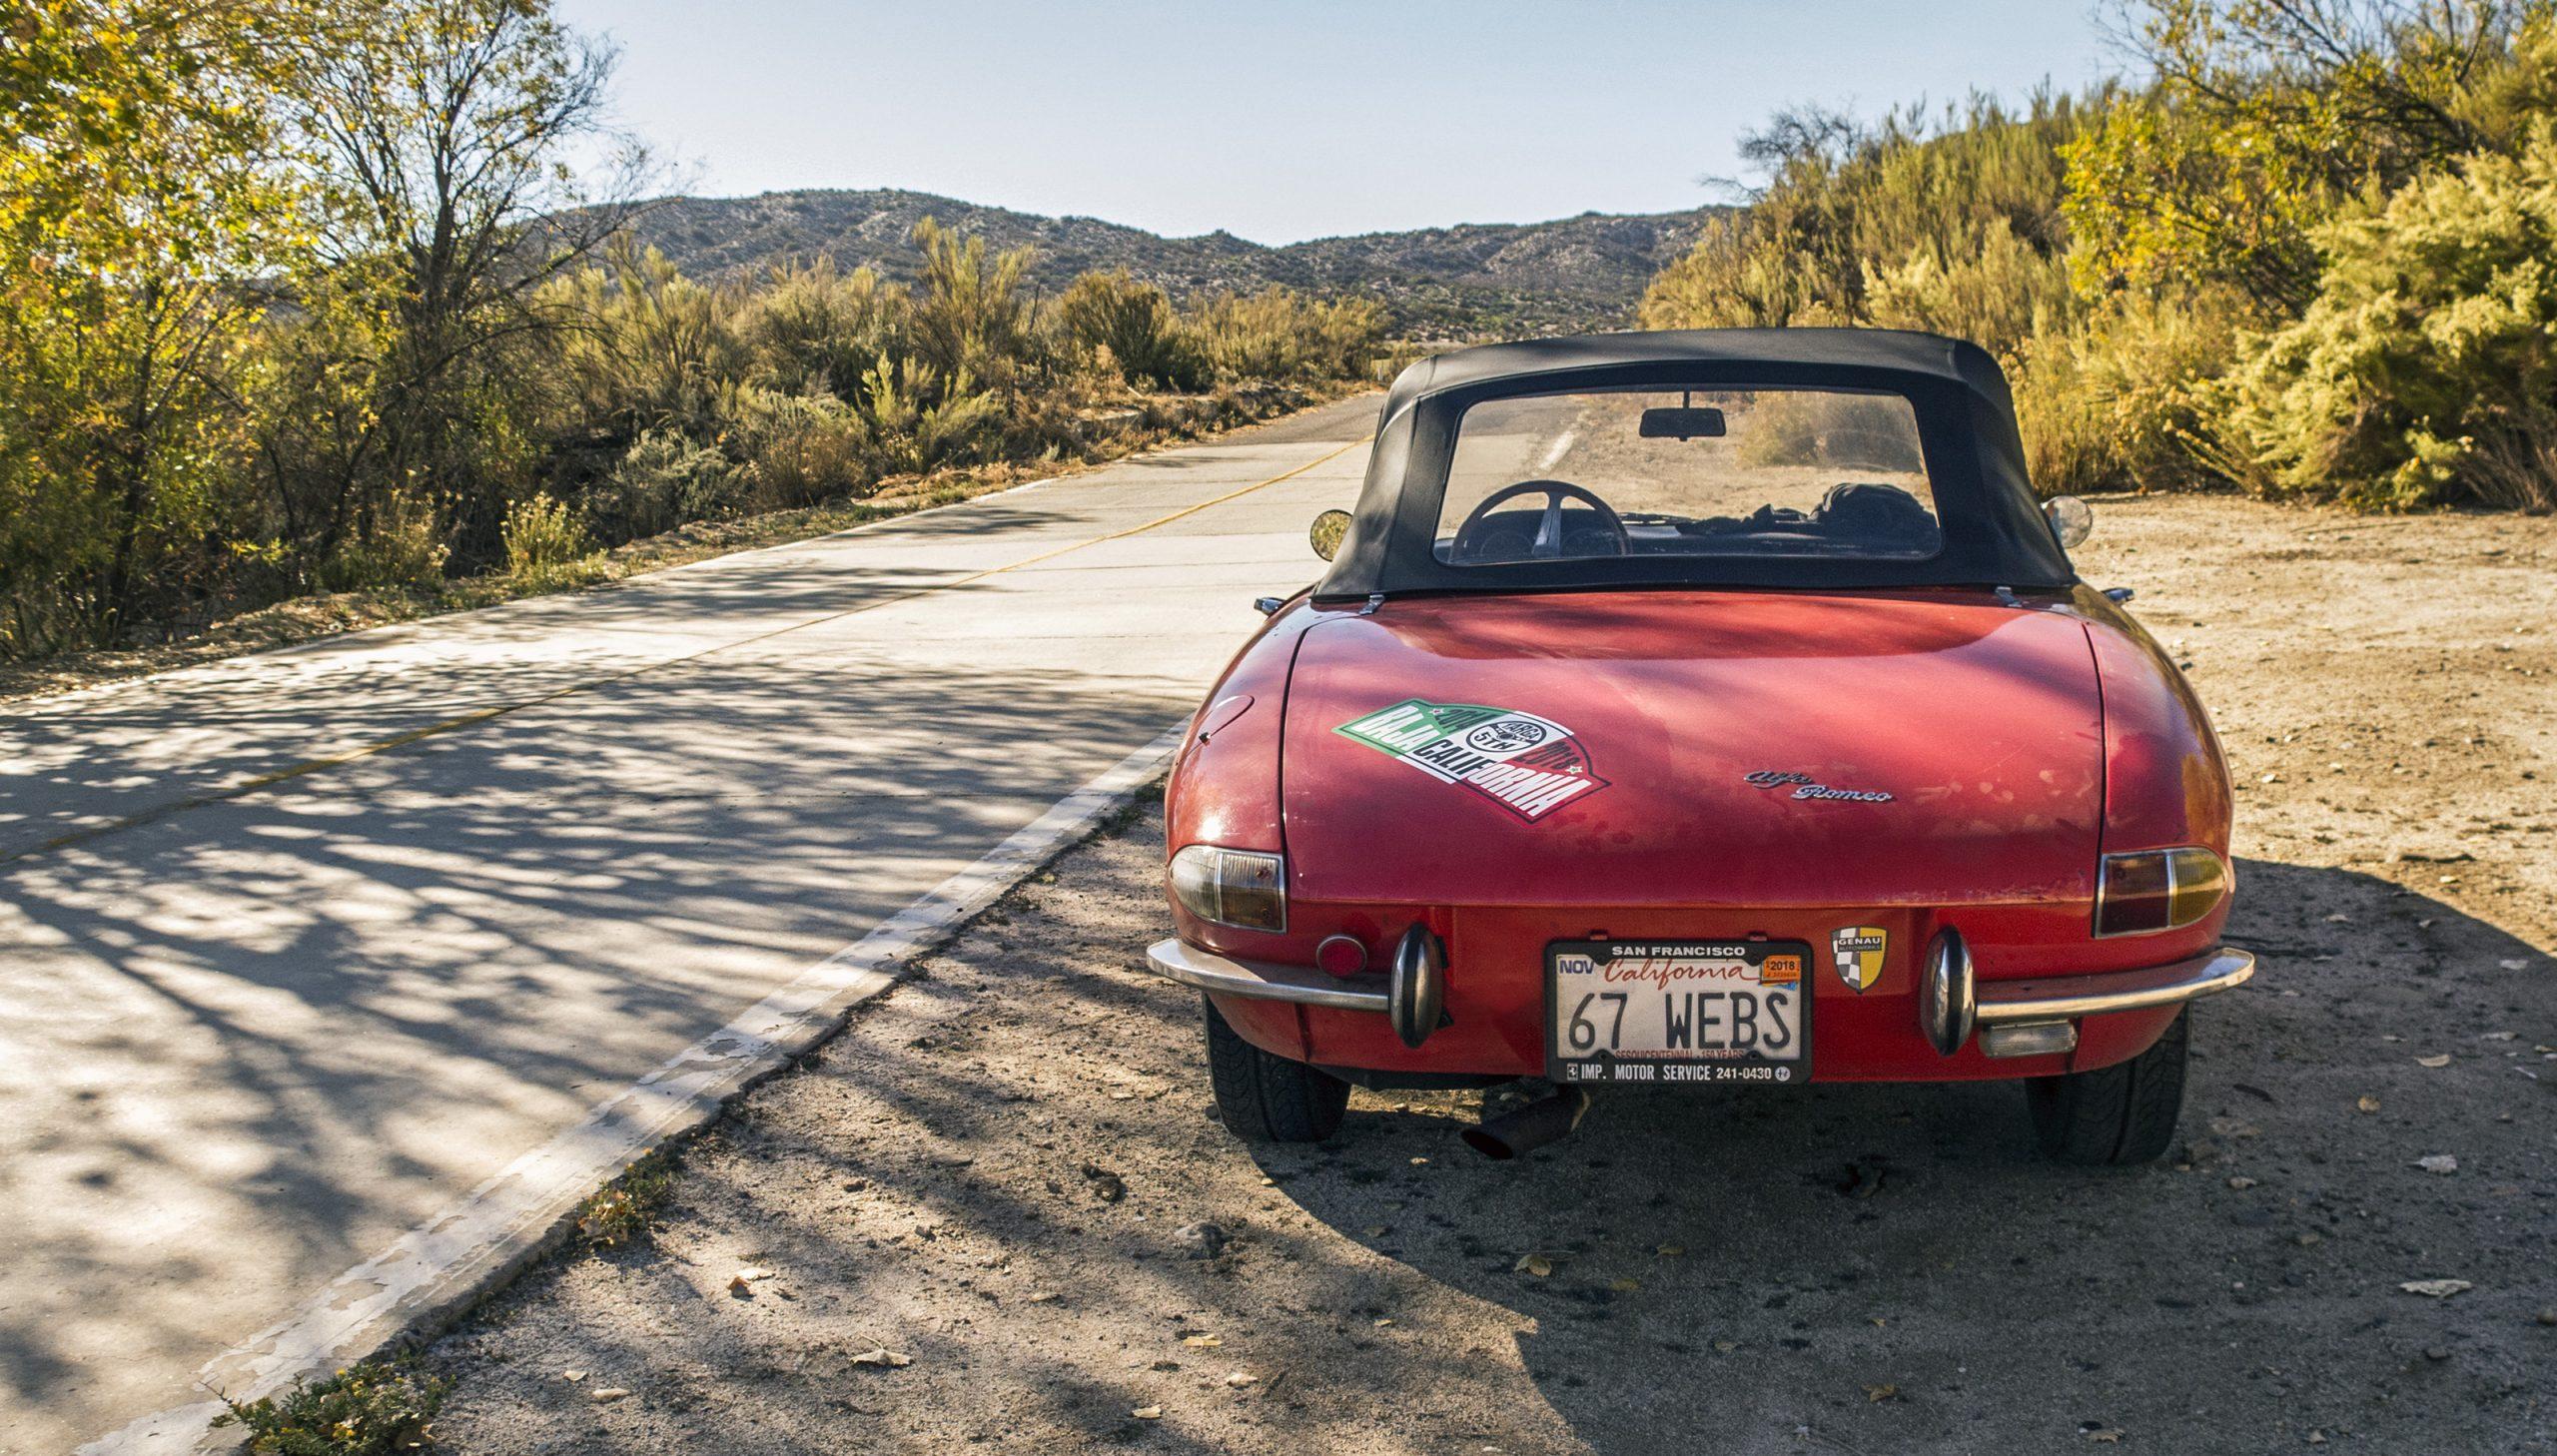 vintage 1967 alfa romeo duetto on roadside rear